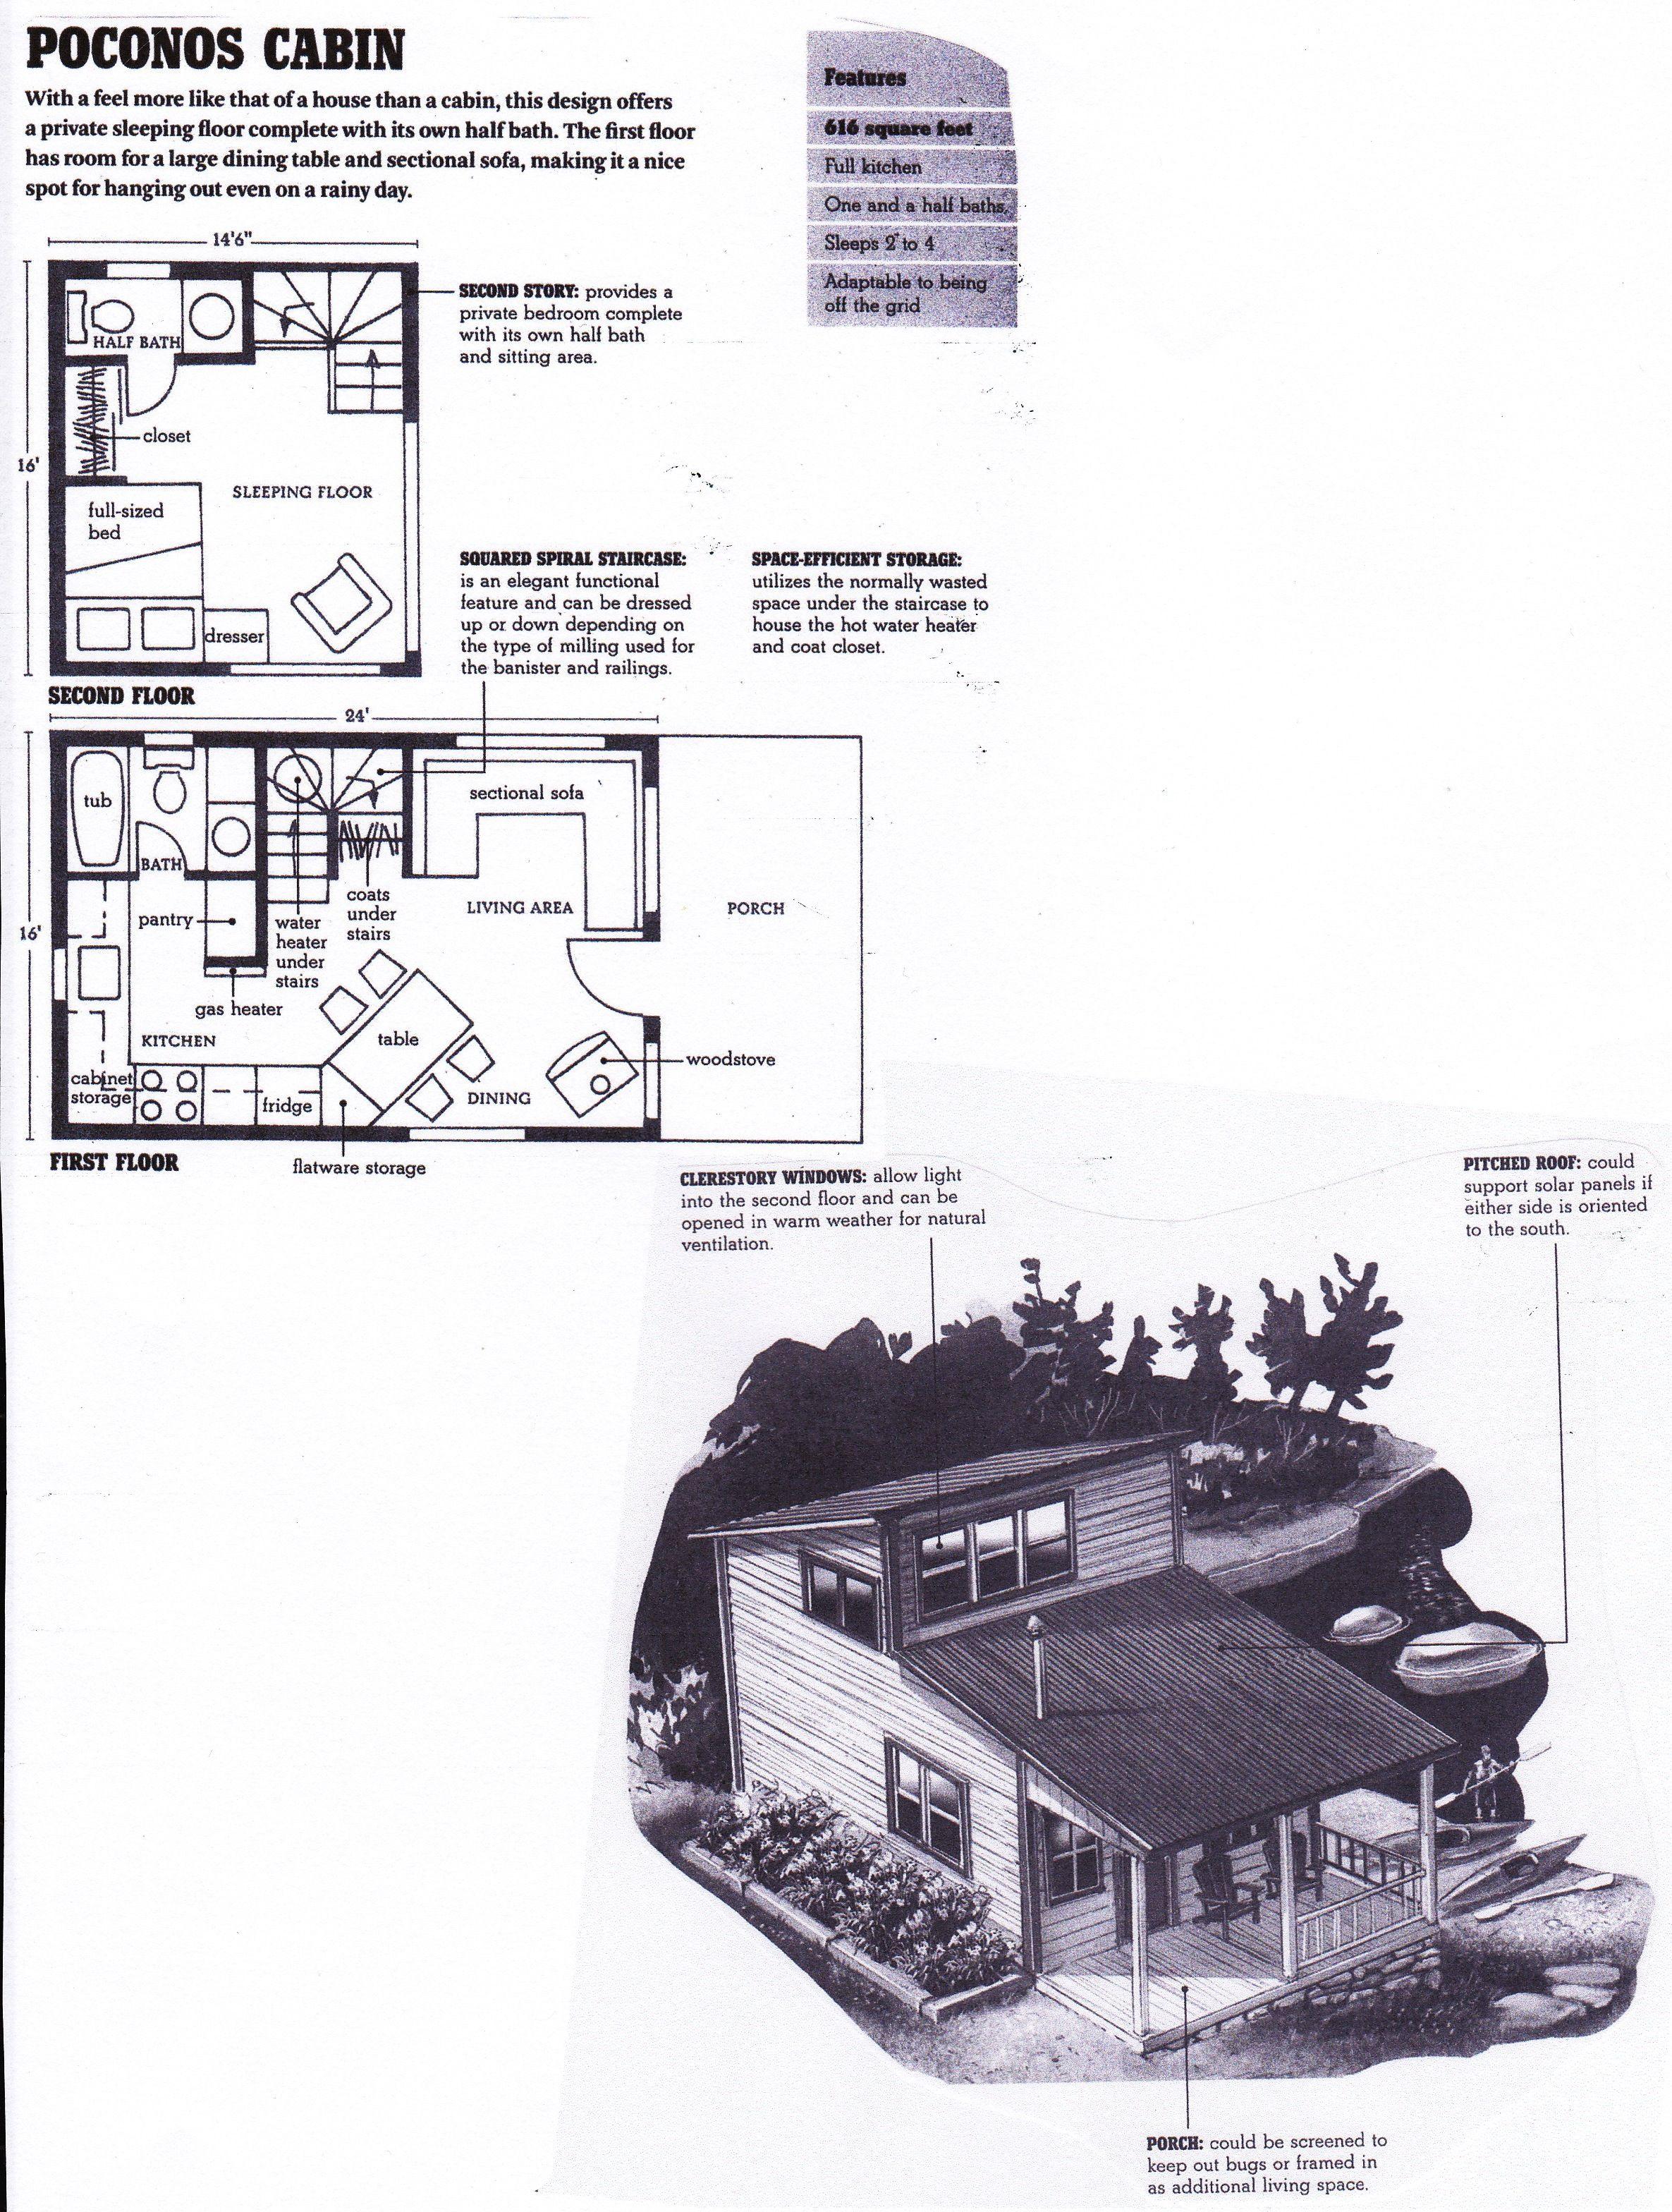 poconos cabin floorplan from u0027compact cabins simple living in